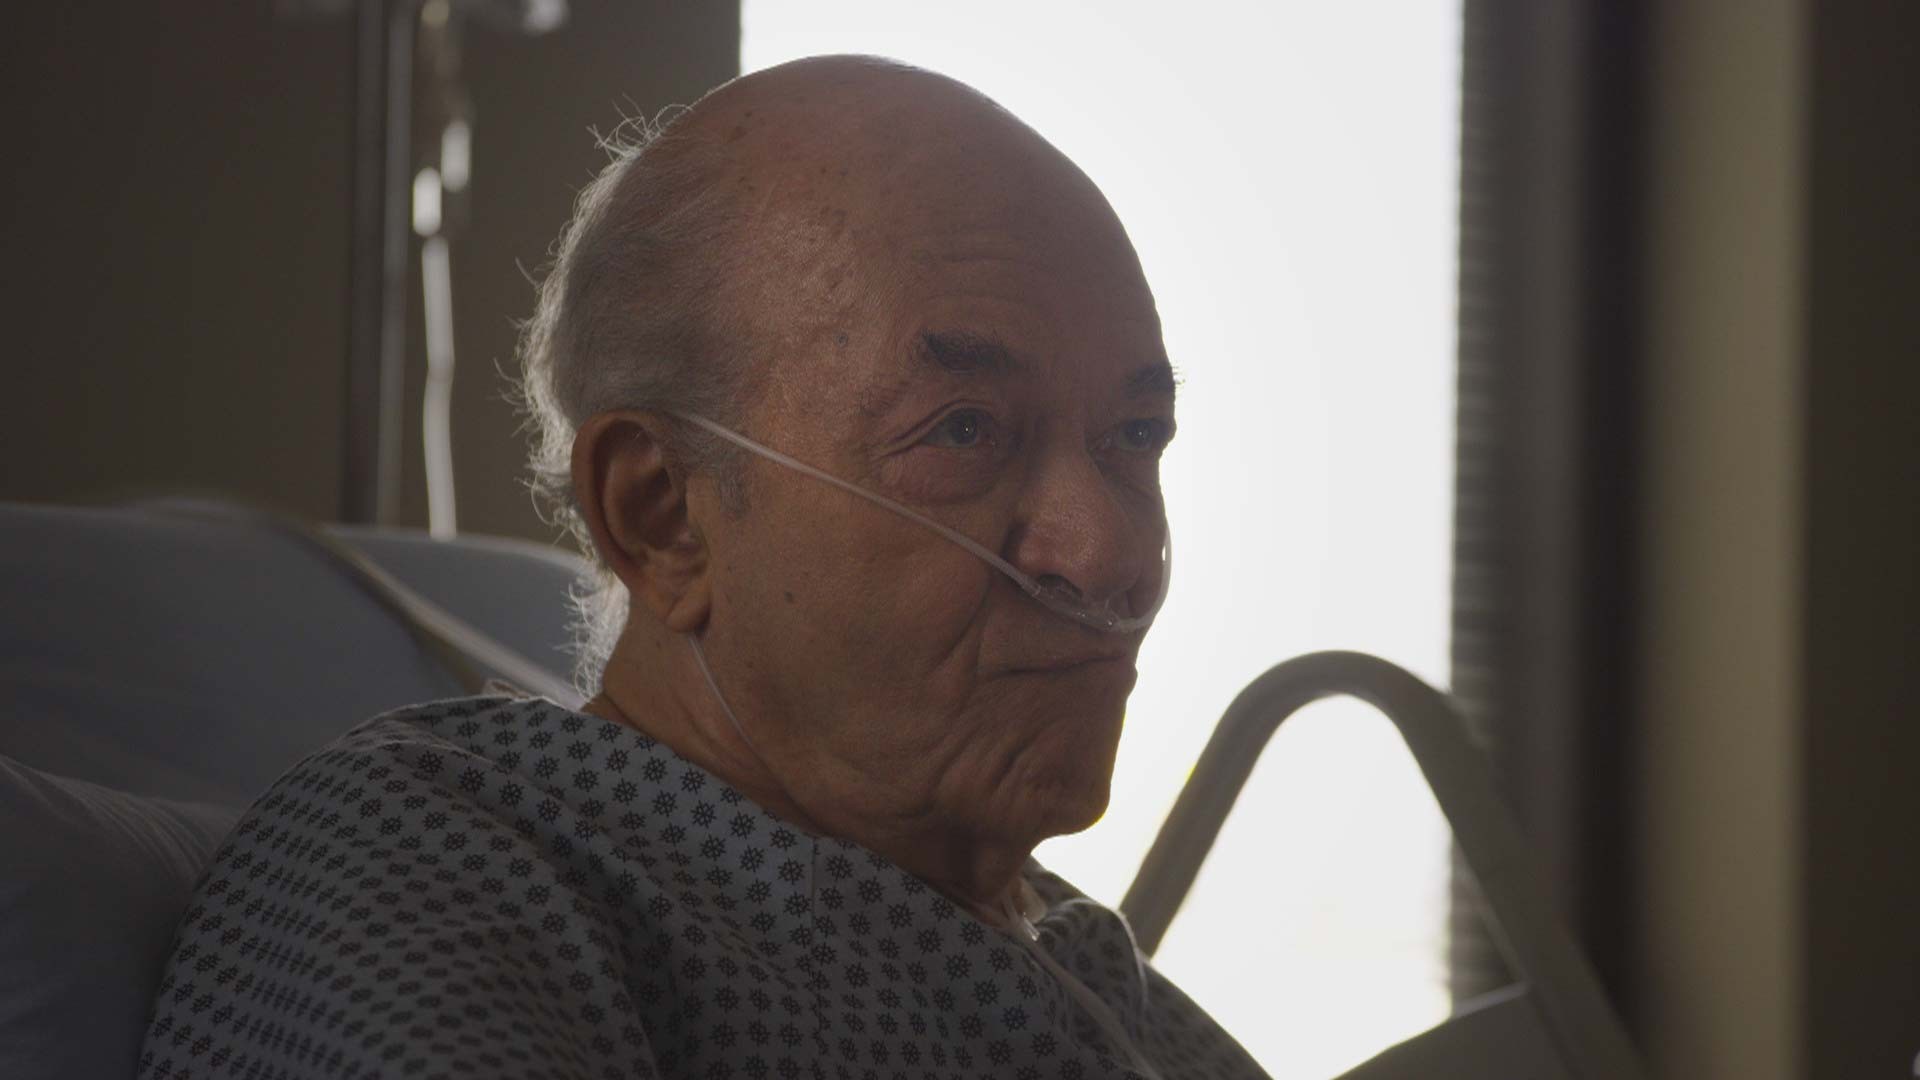 Better Call Saul Sneak Peek: Season 4, Episode 7